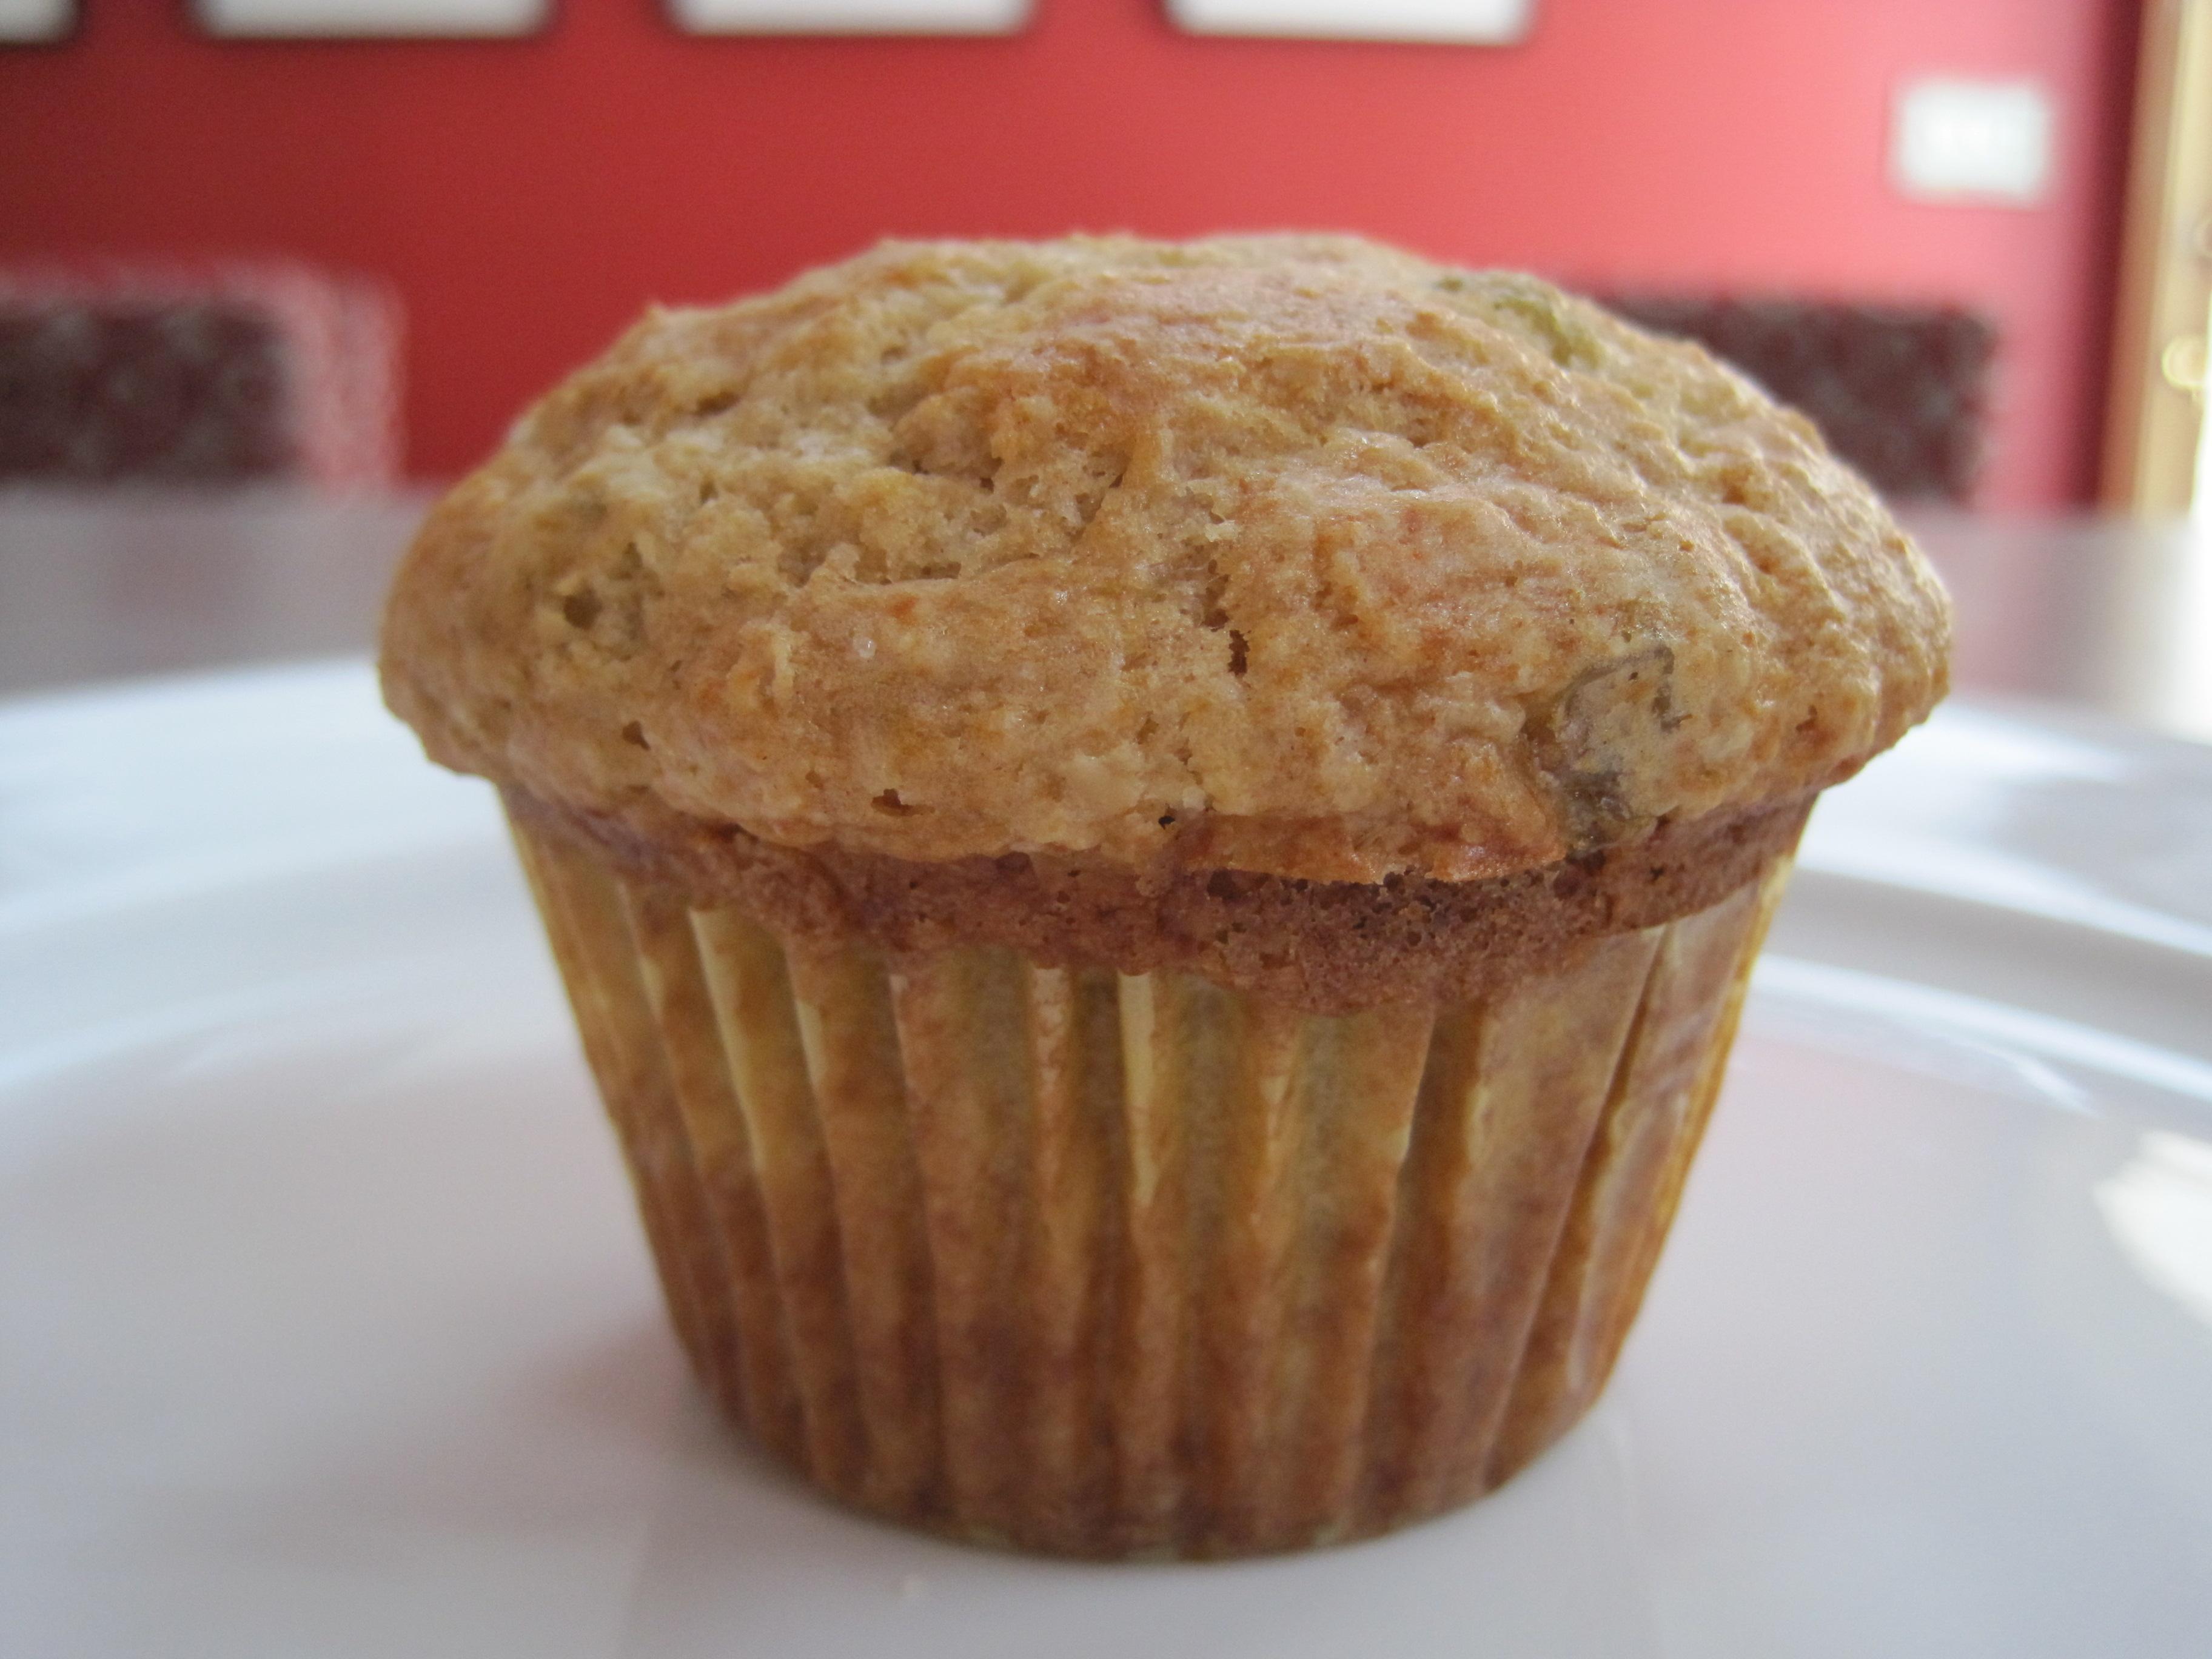 Golden Raisin Oat Bran Muffins Recipes — Dishmaps